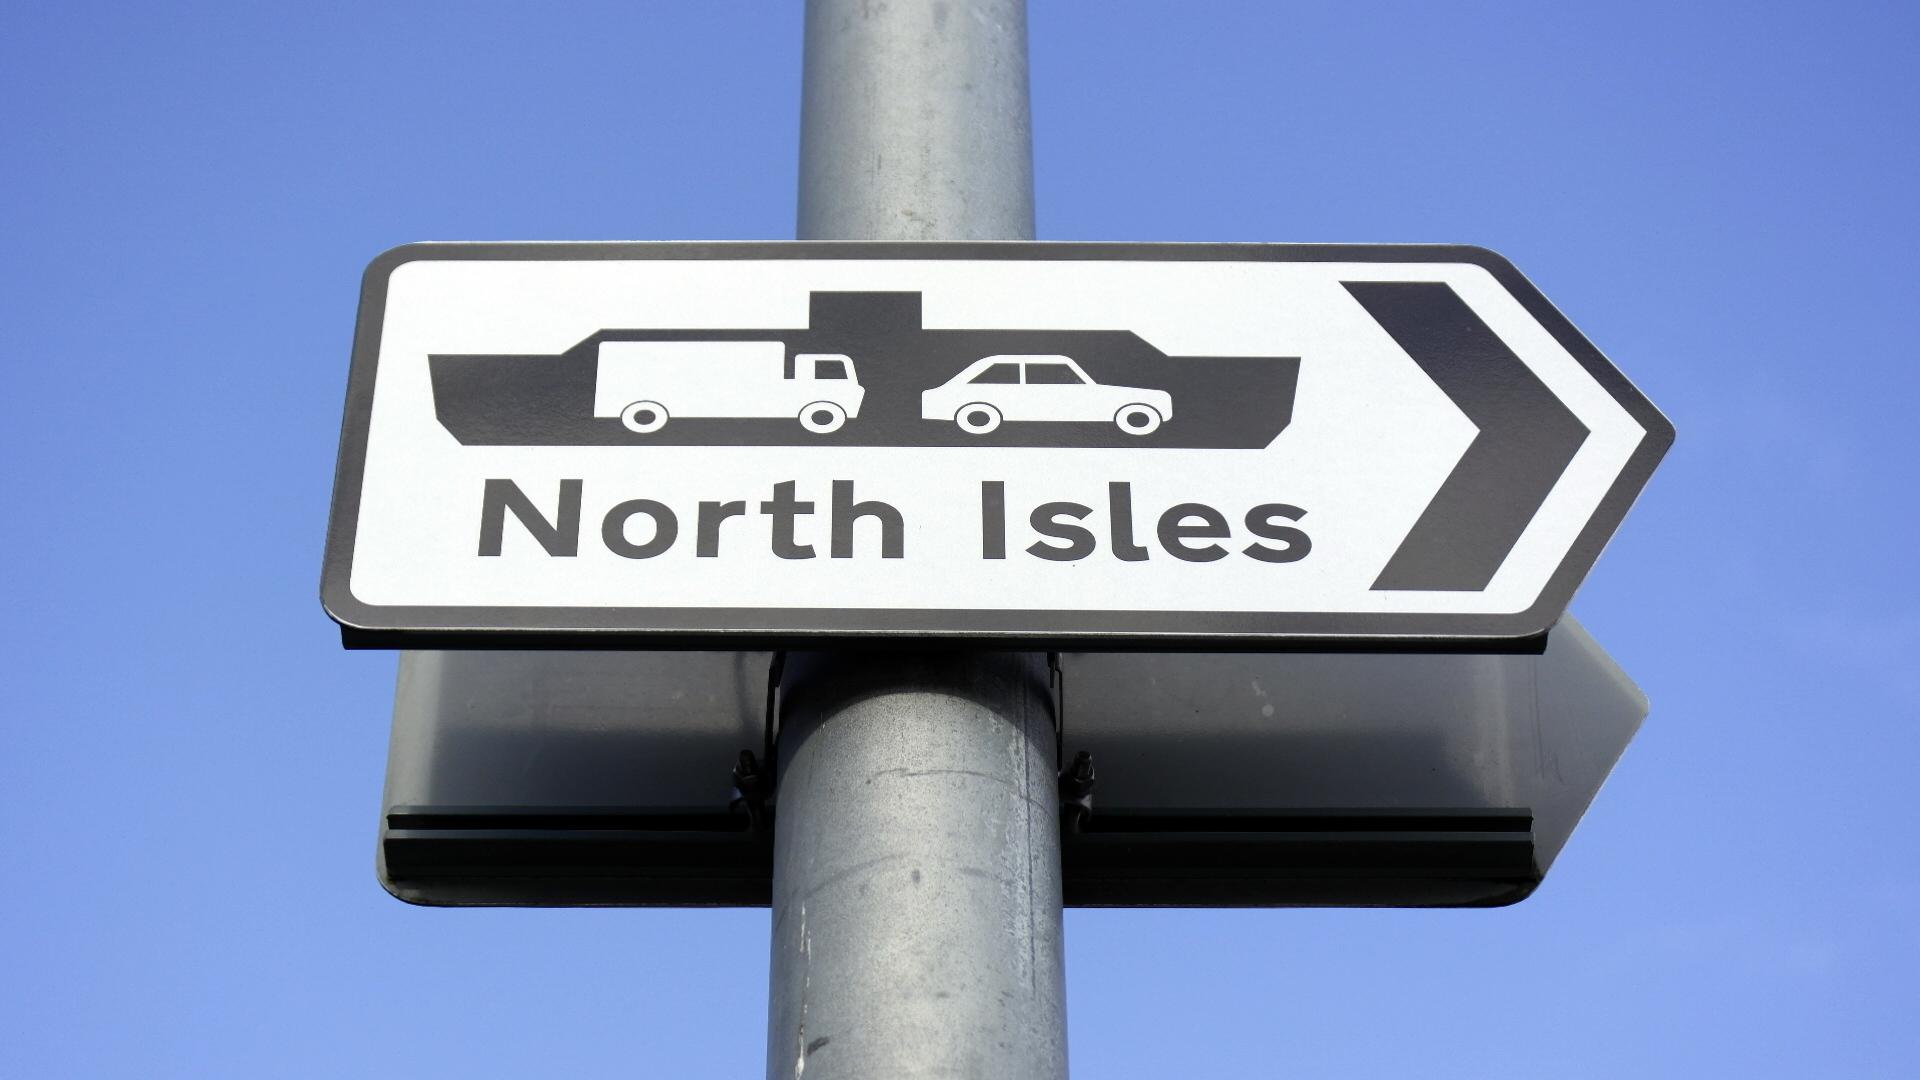 North Isles